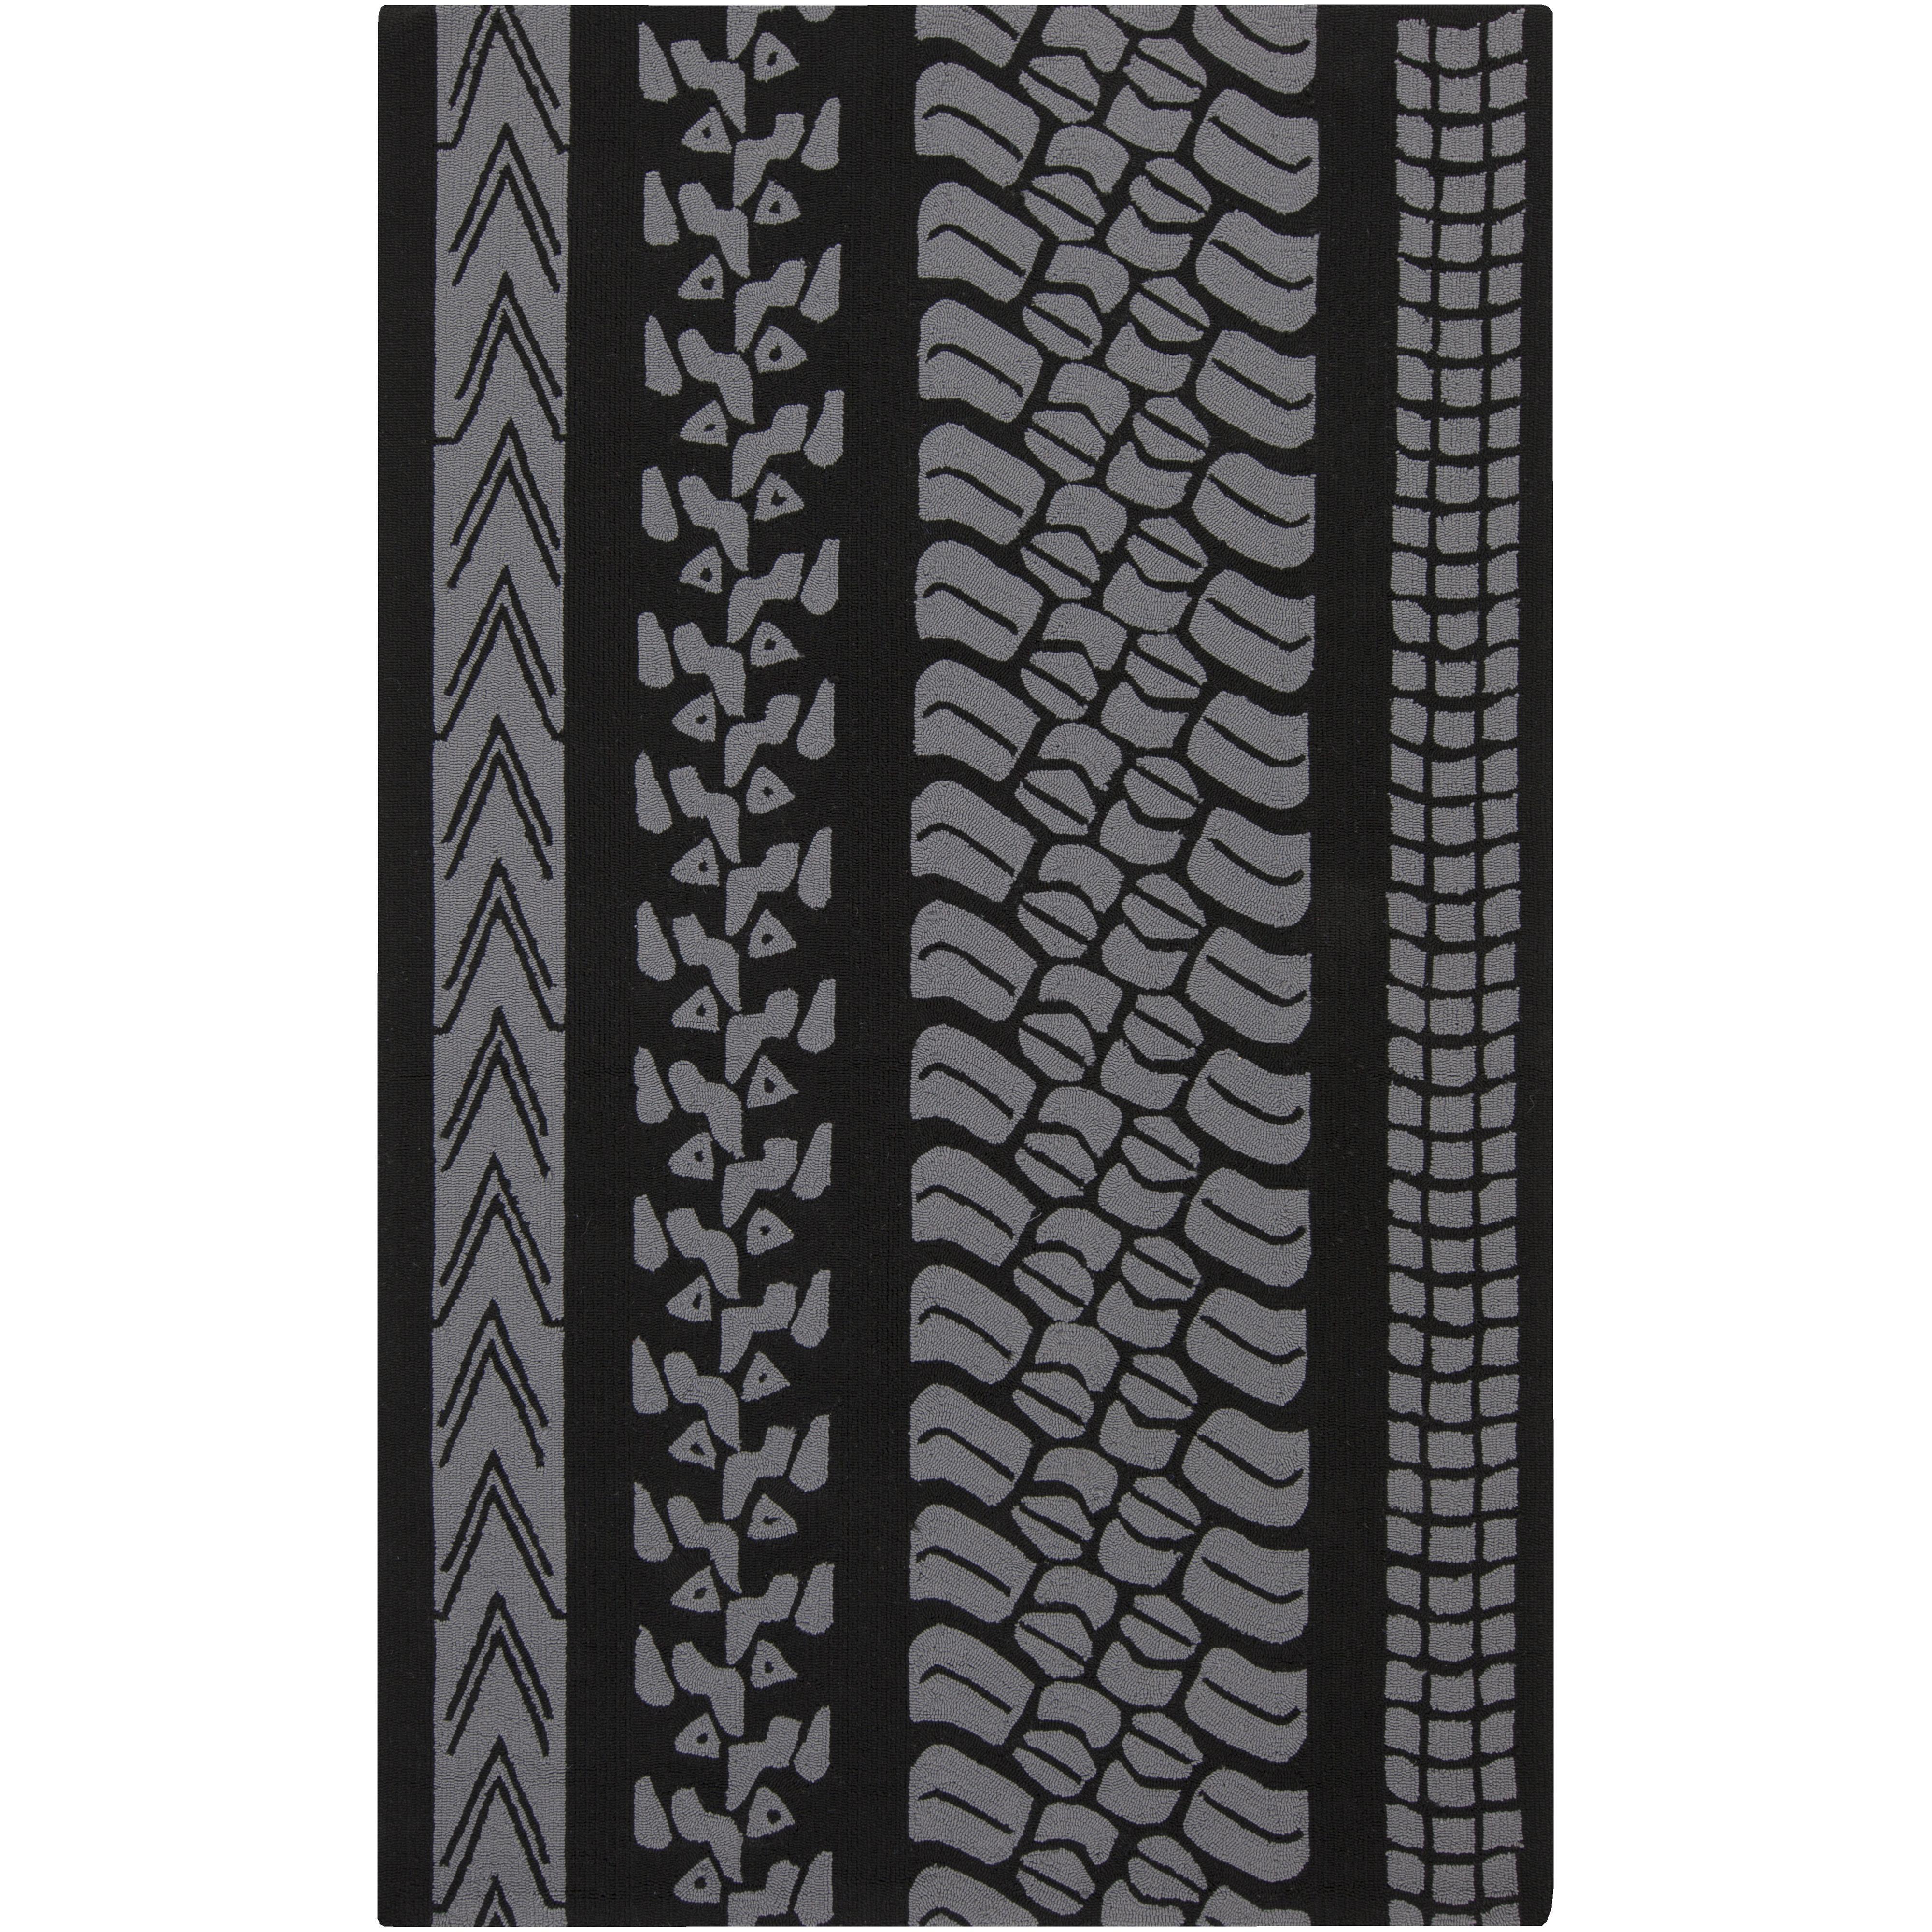 Surya Rugs Pandemonium 5' x 8' - Item Number: PDM1006-58